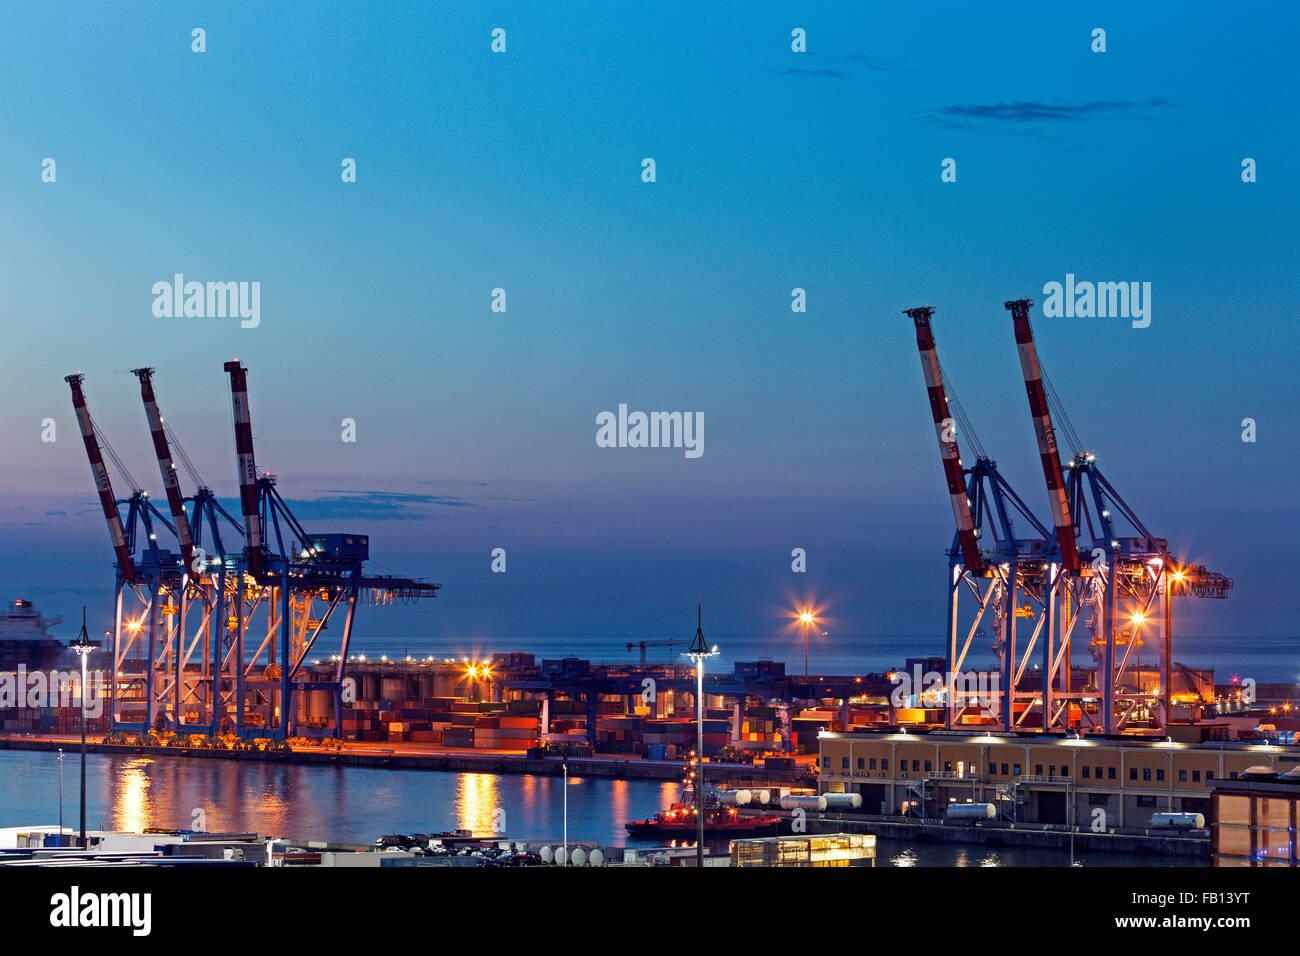 Genoa harbor cranes at sunrise - Stock Image